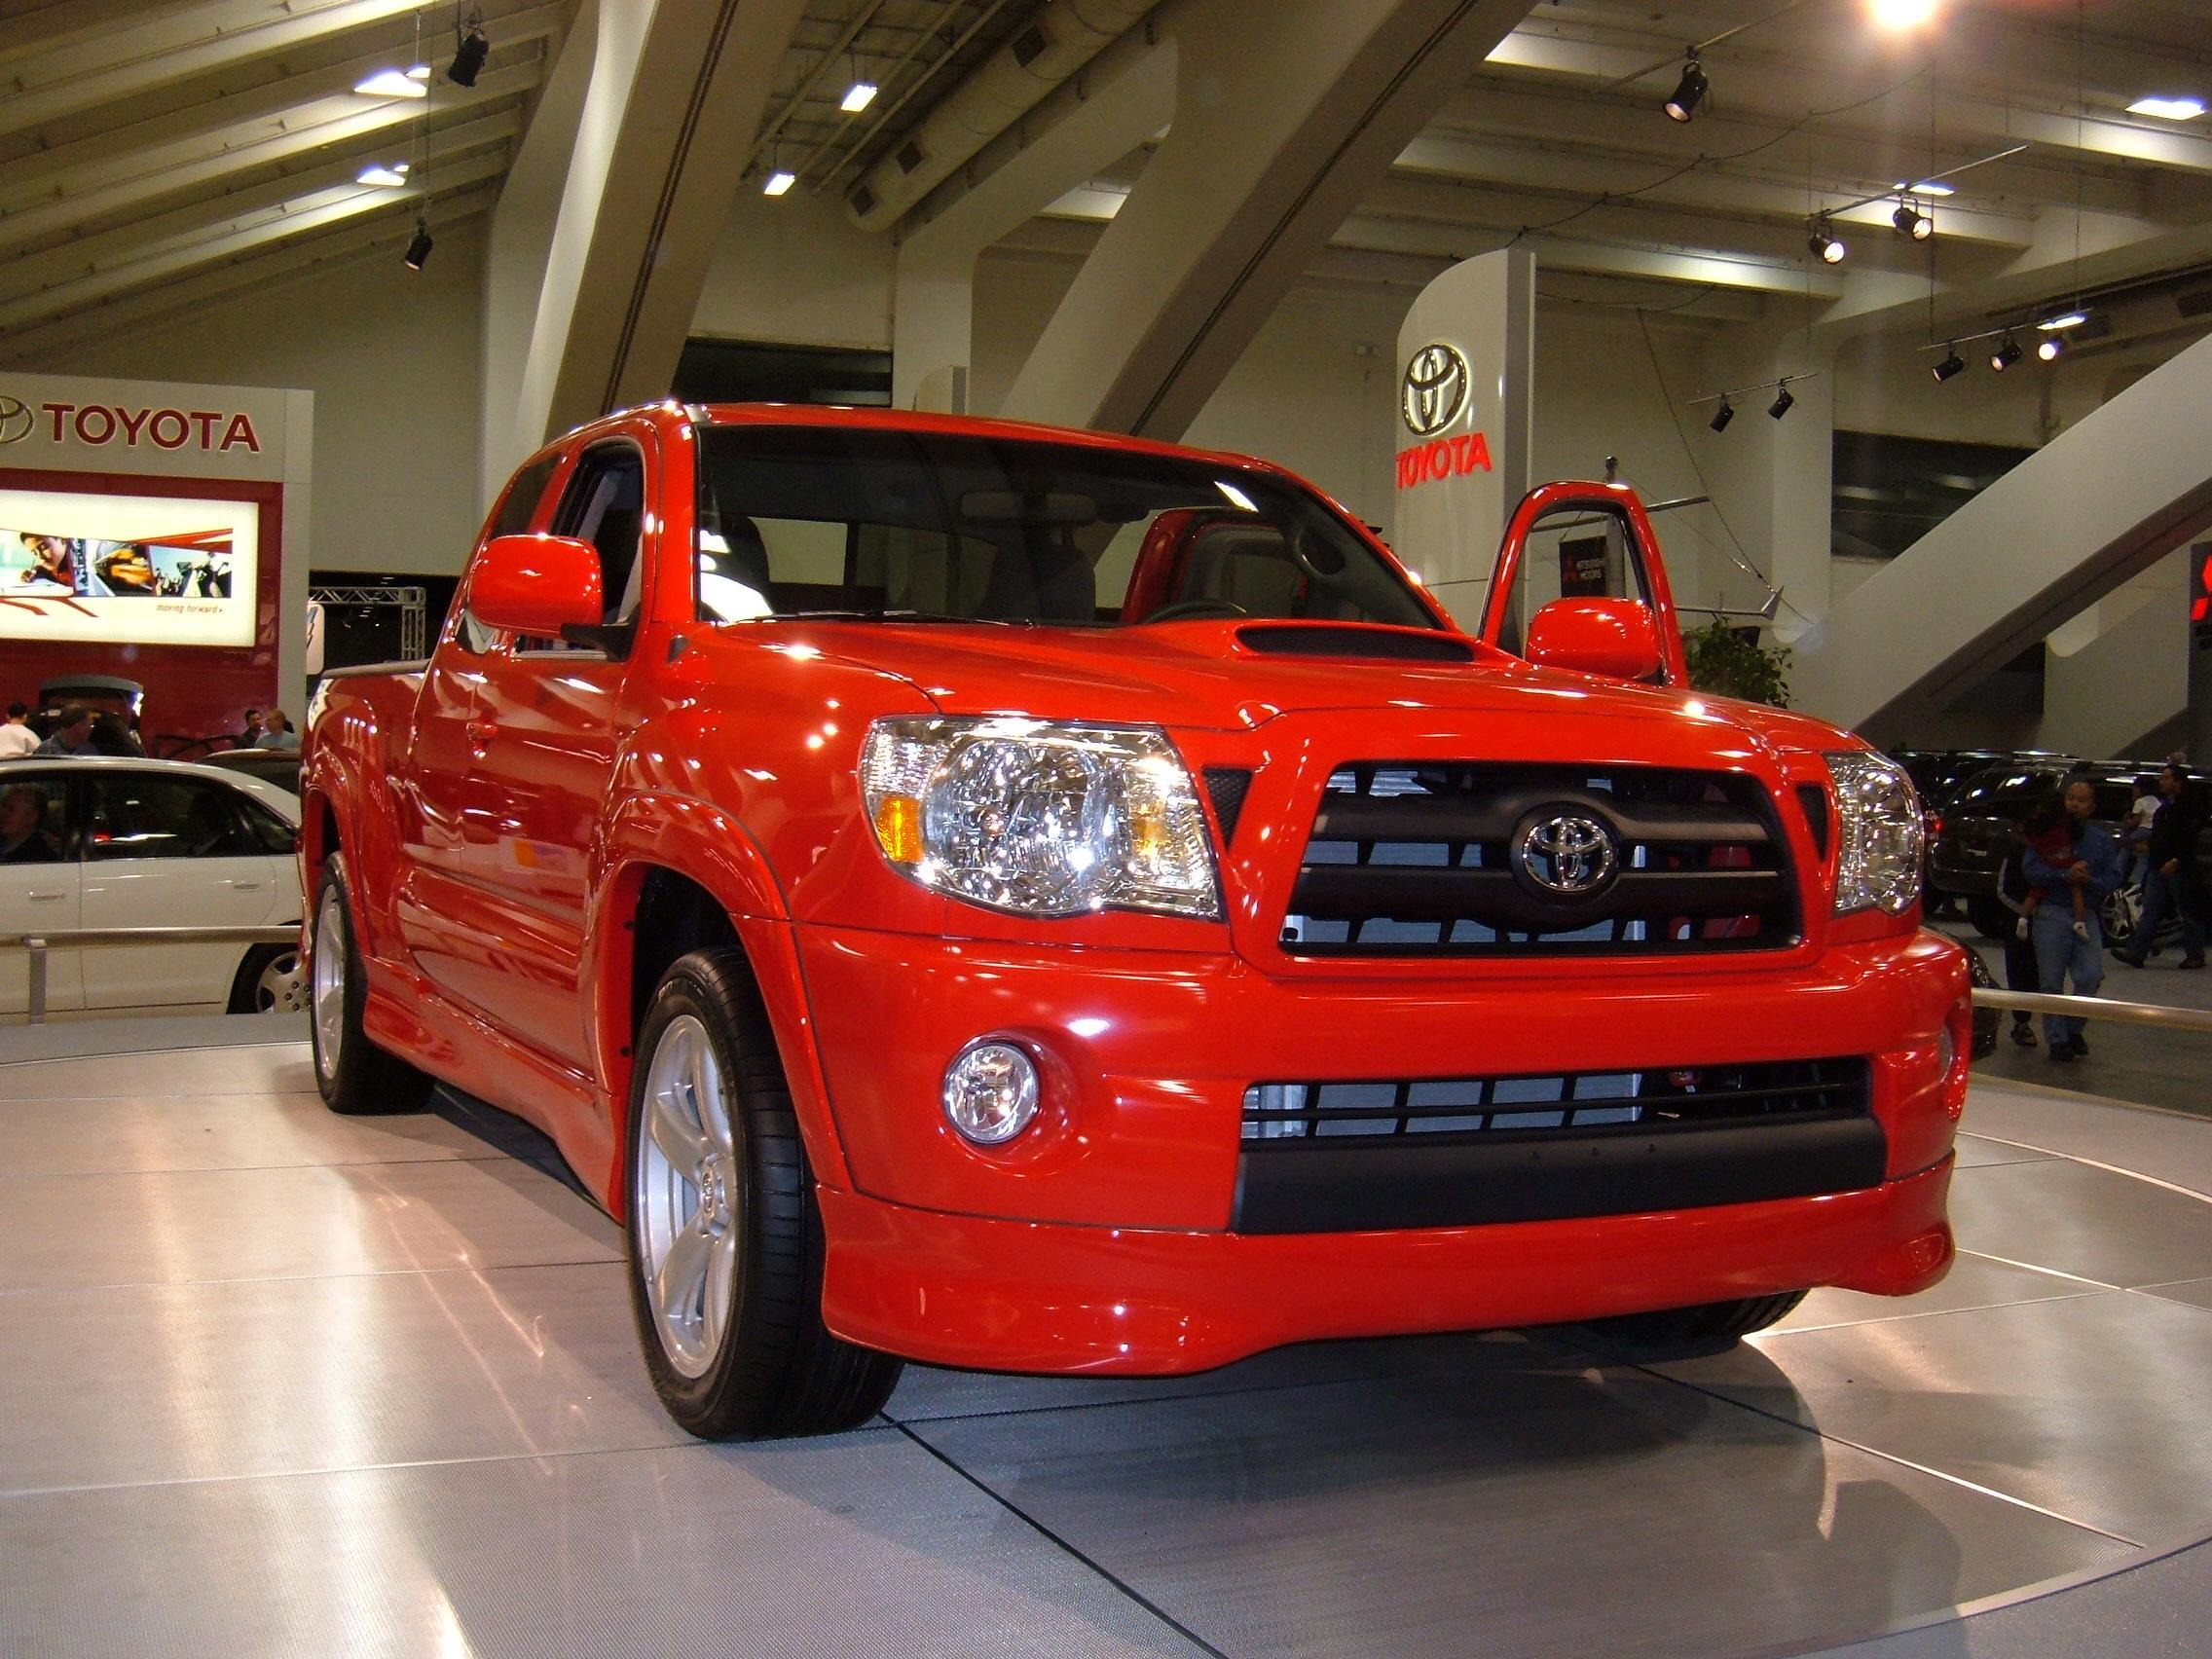 Toyota Tacoma X Runner >> File:2005 red Toyota Tacoma X-Runner.JPG - Wikimedia Commons